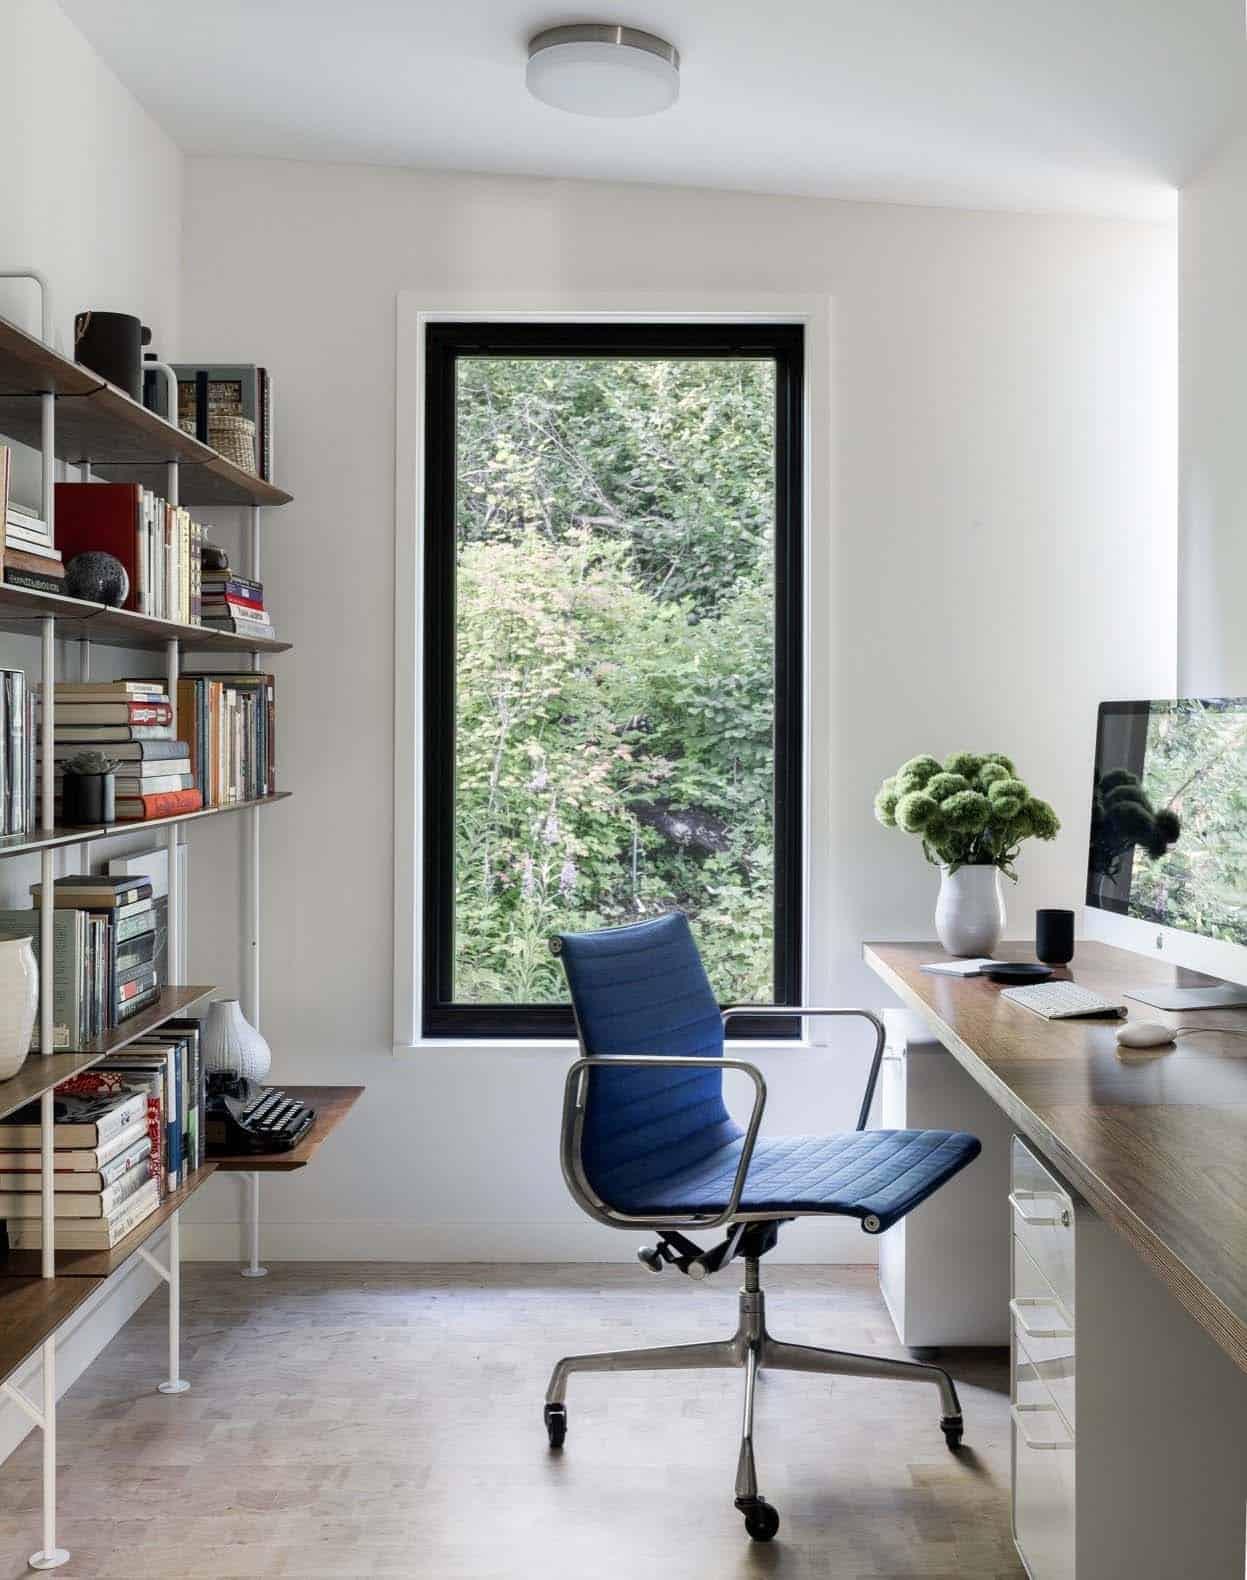 cabane-contemporaine-maison-bureau